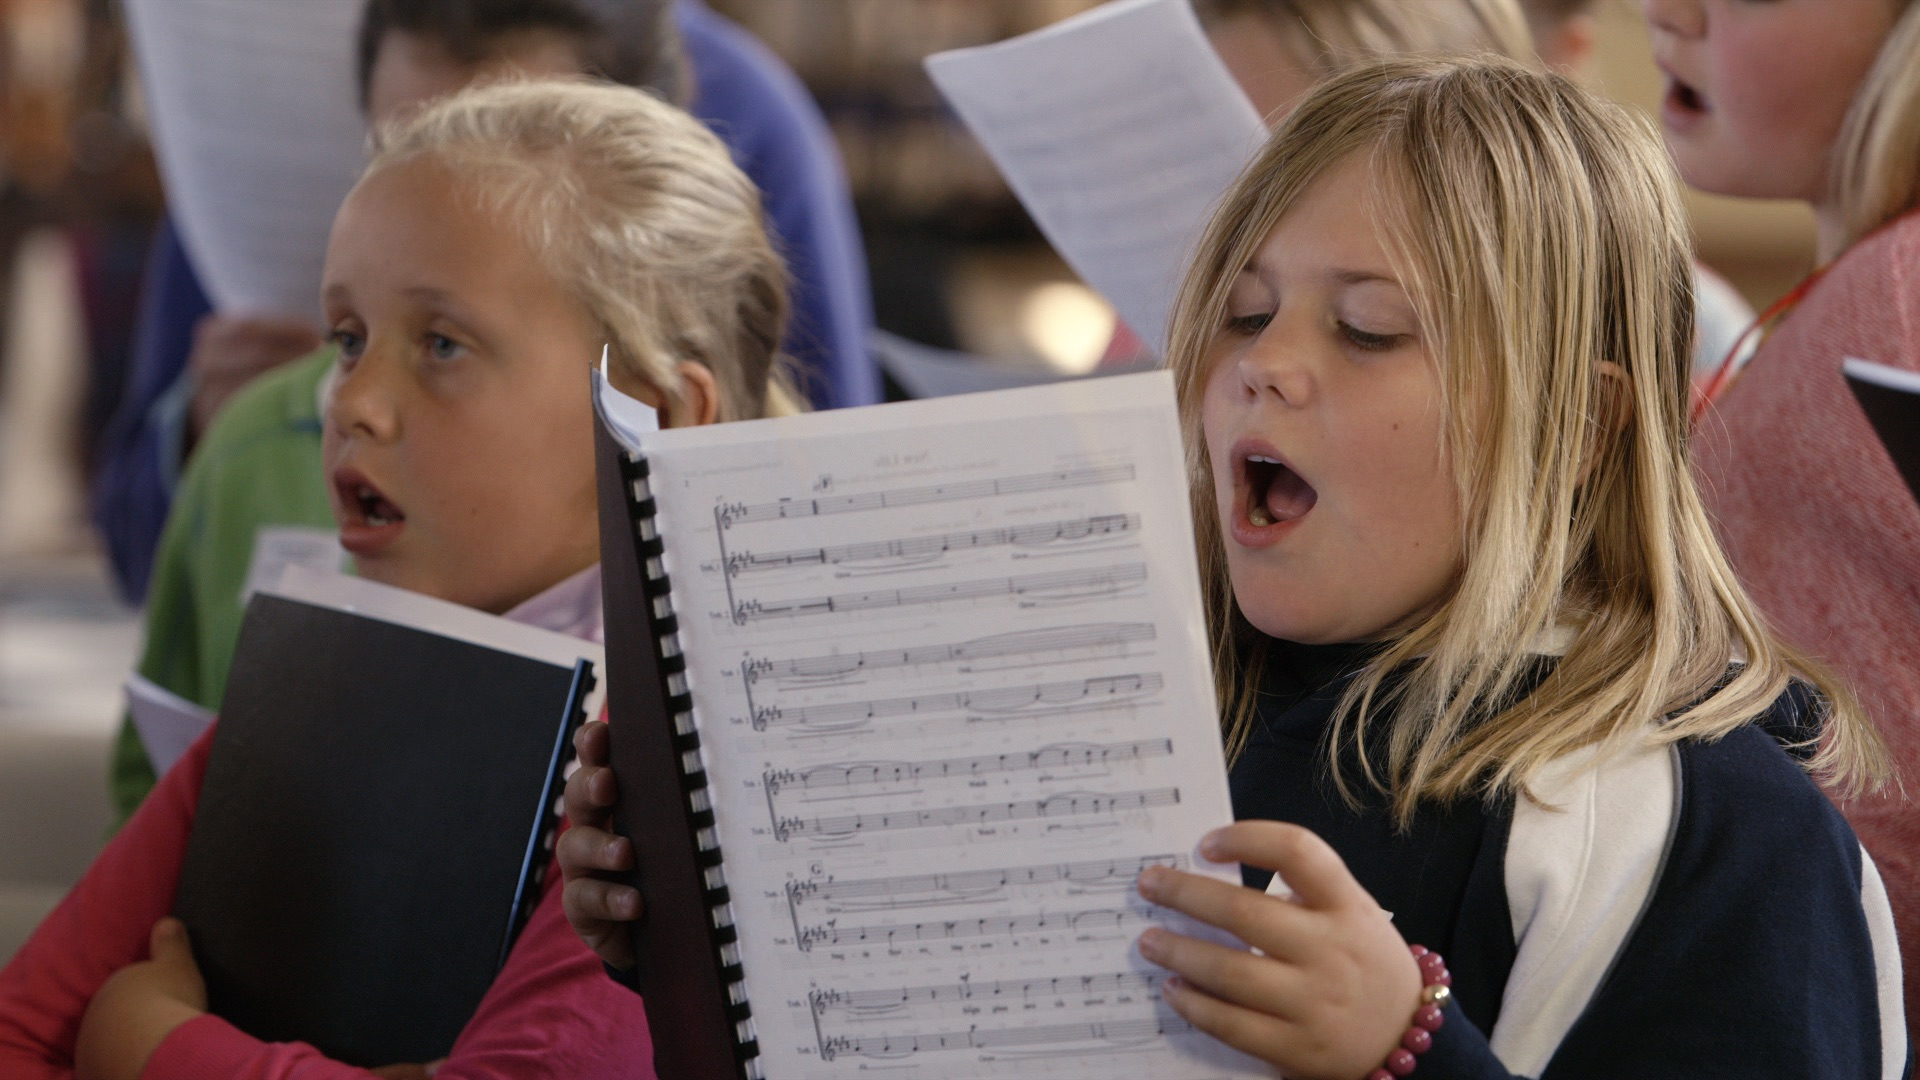 Katelyn singing